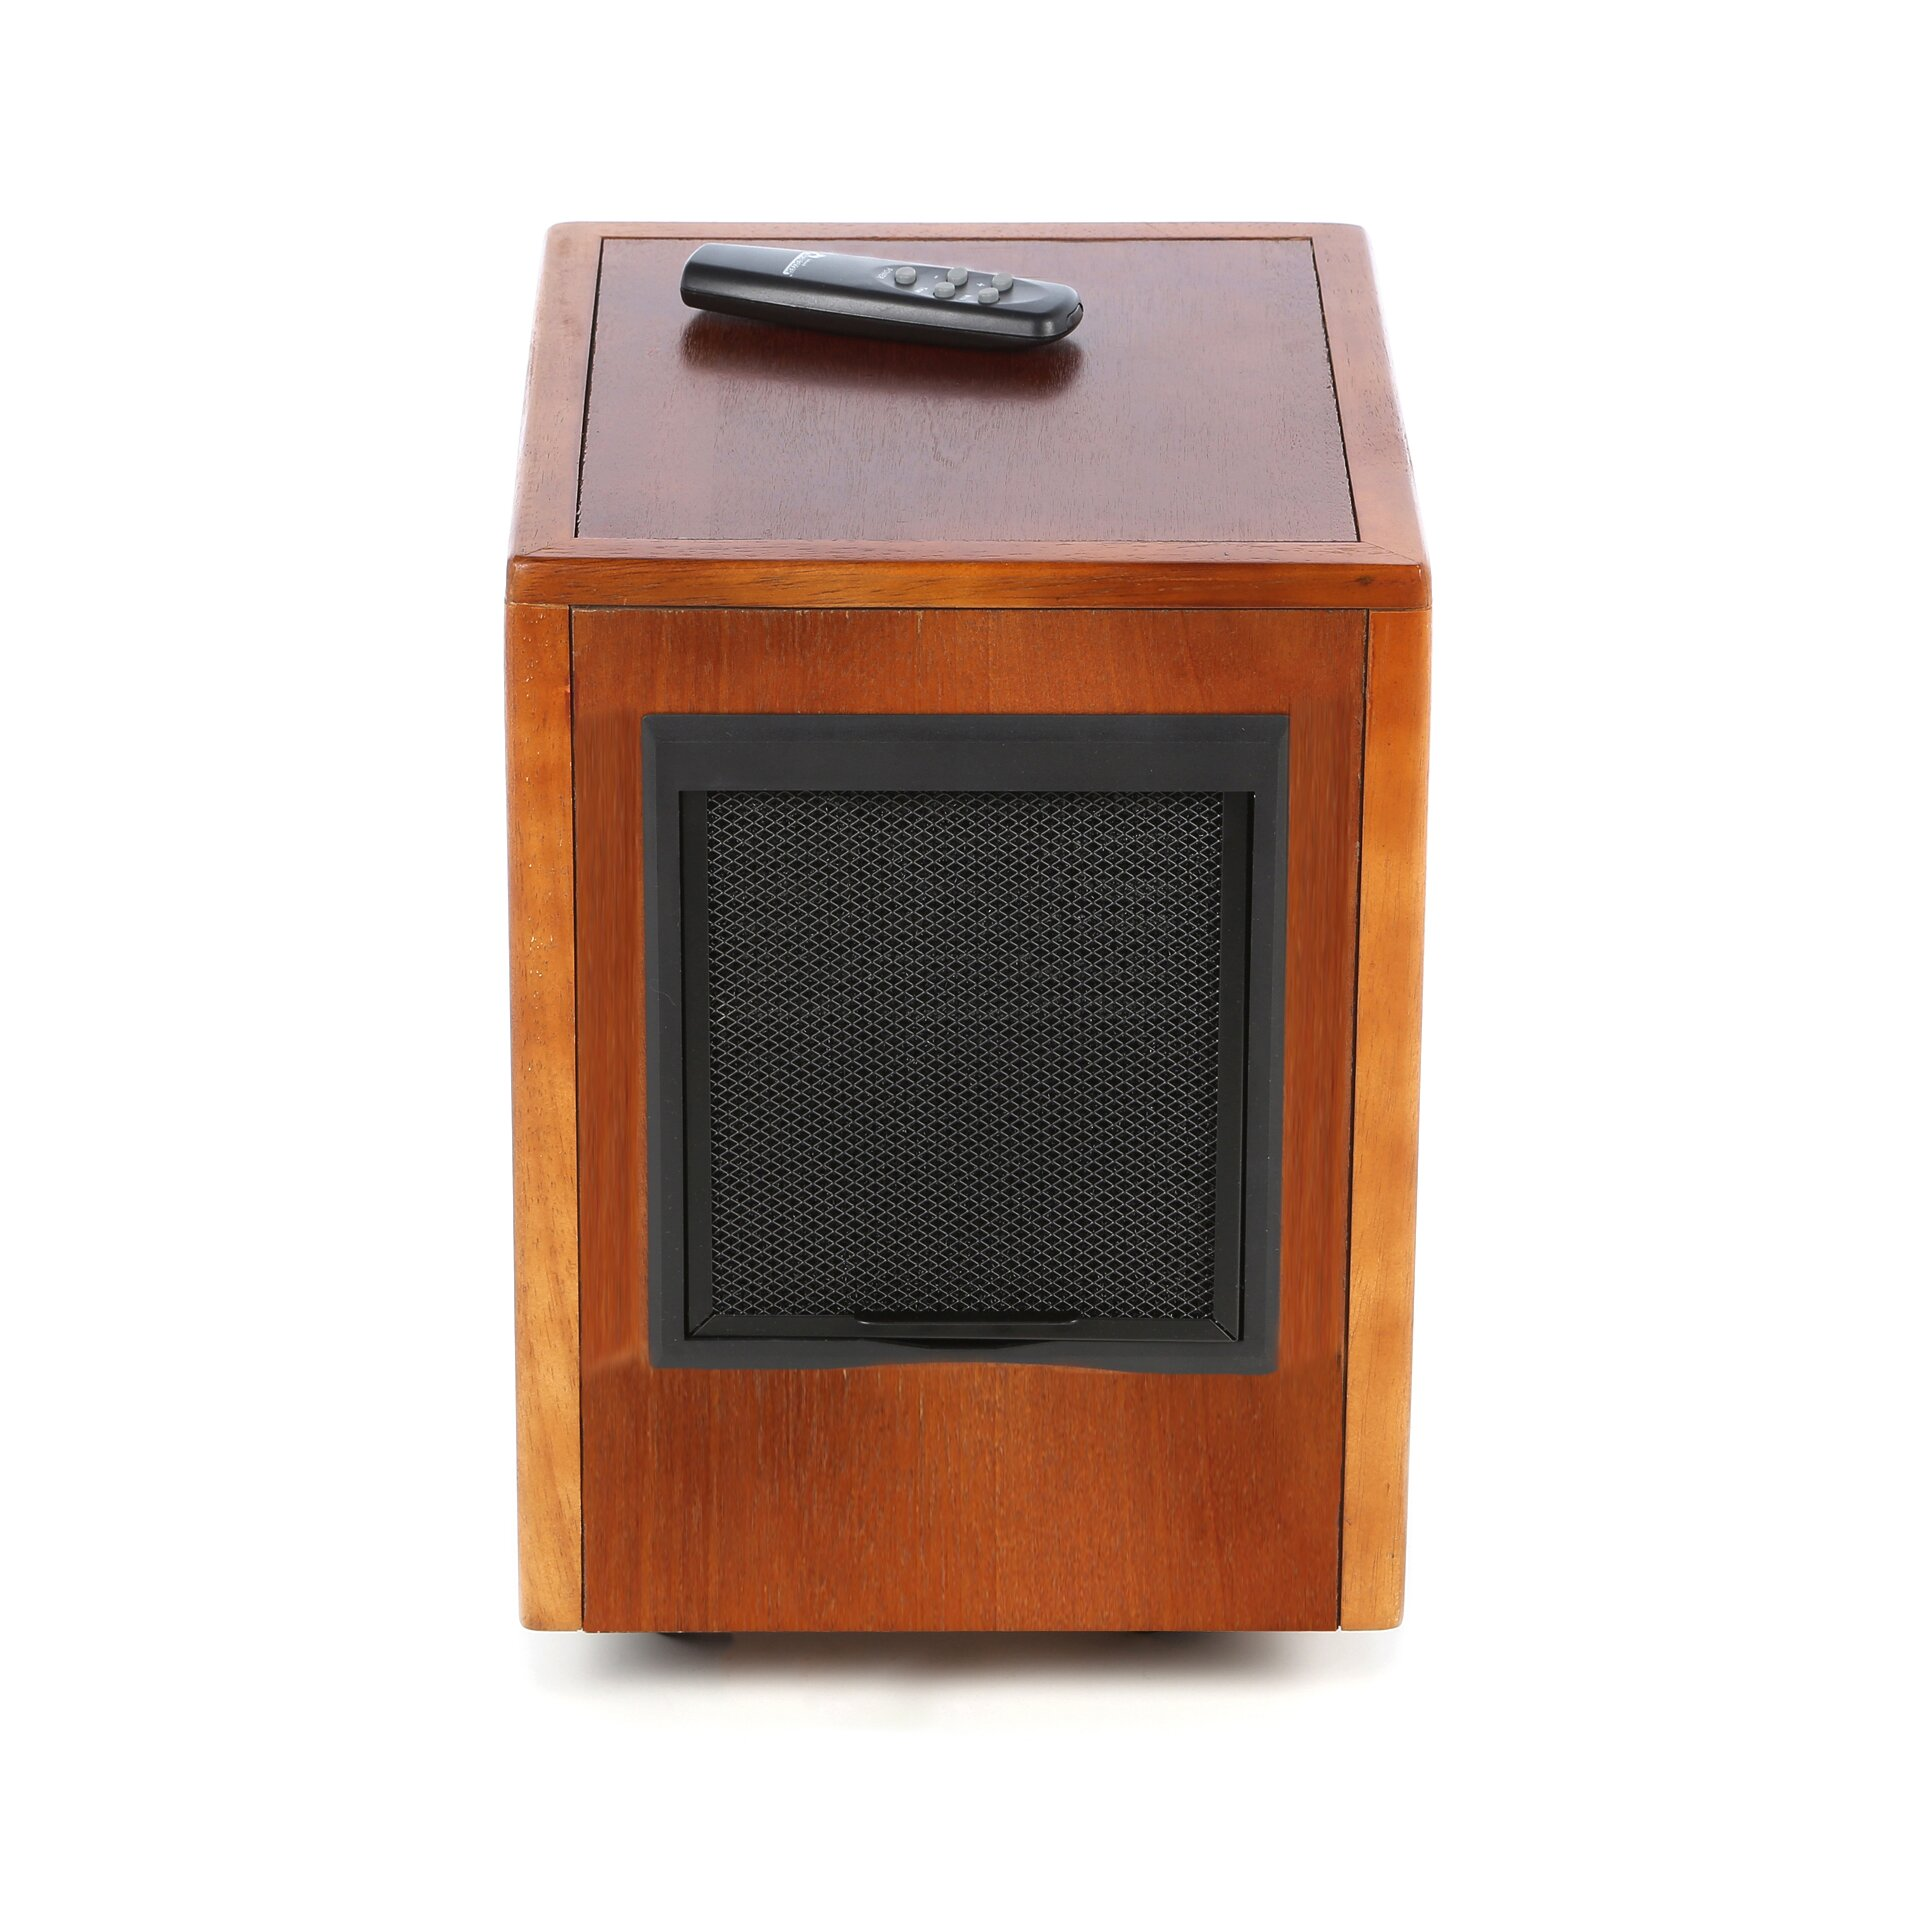 Heater 1,500 Watt Portable Electric Infrared Cabinet Heater & Reviews